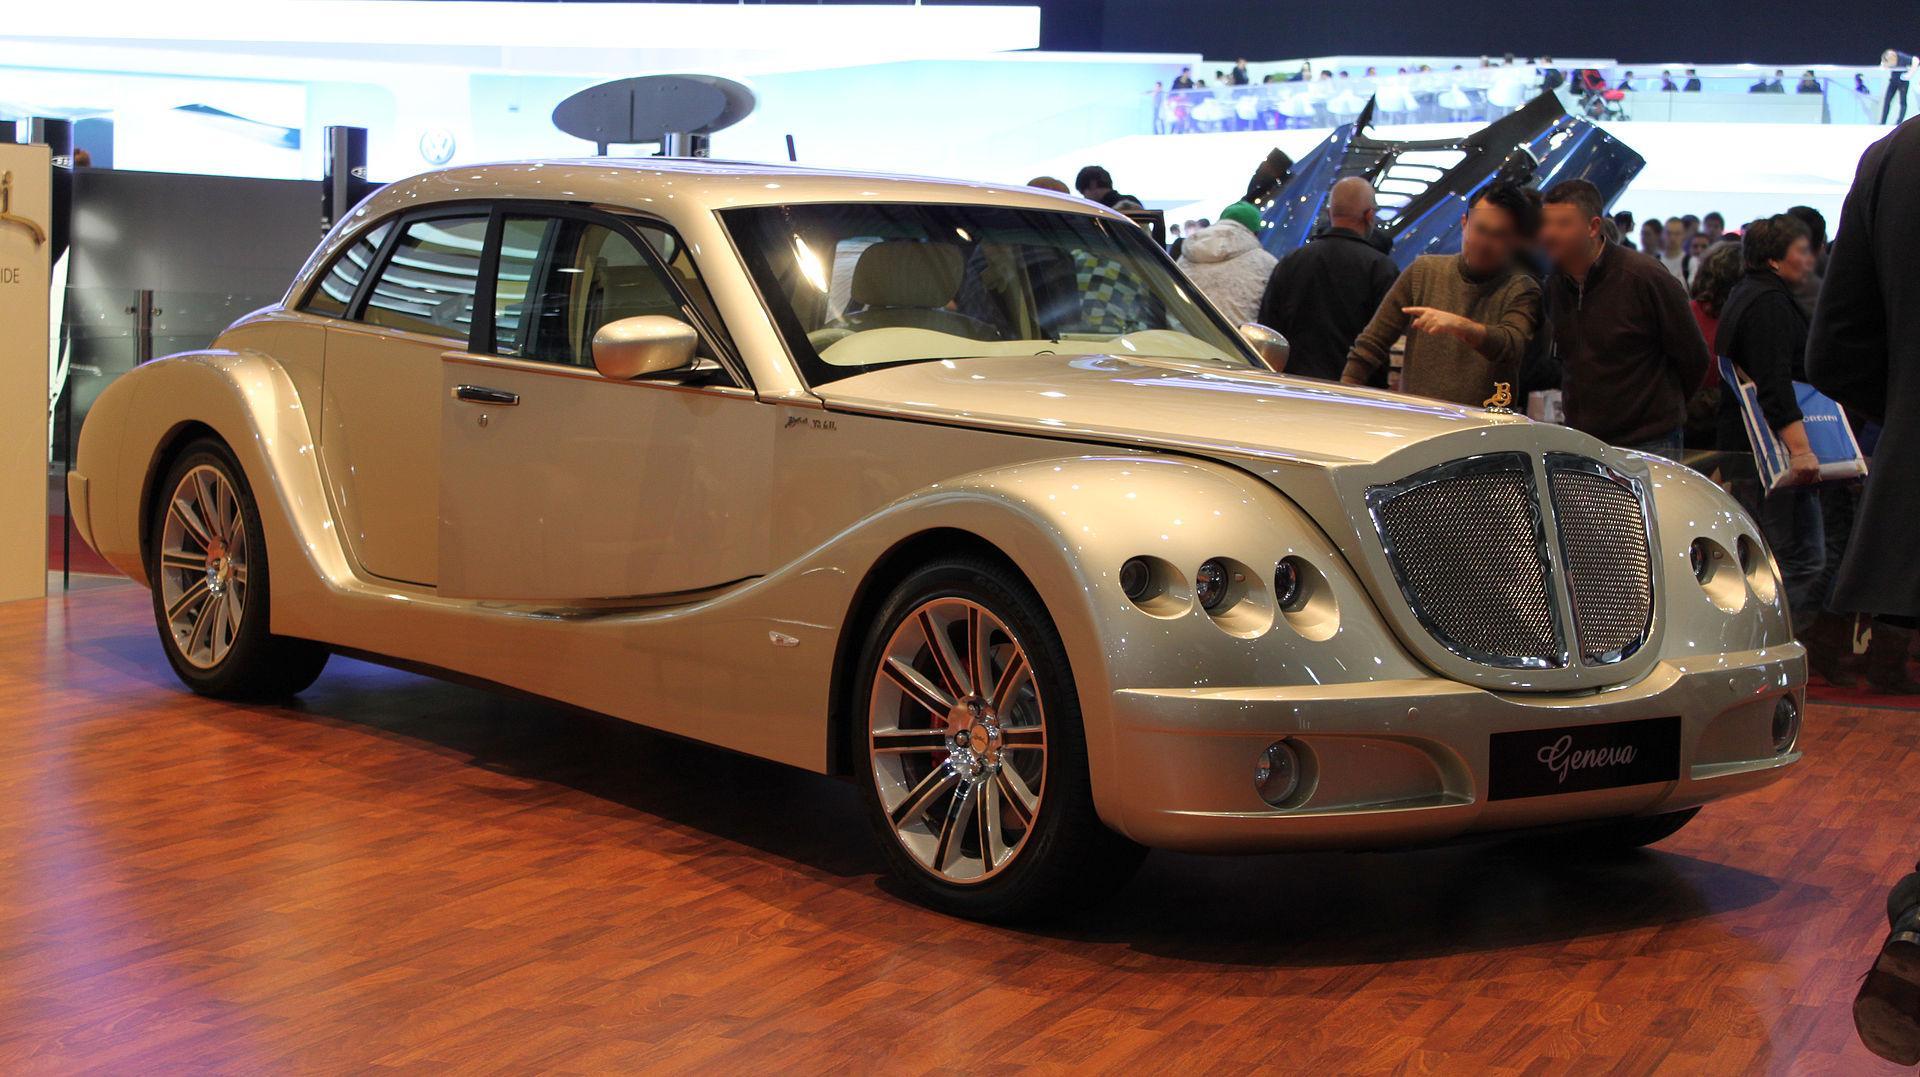 Gold Bufori Geneva. Luxurious, classy, ugly.